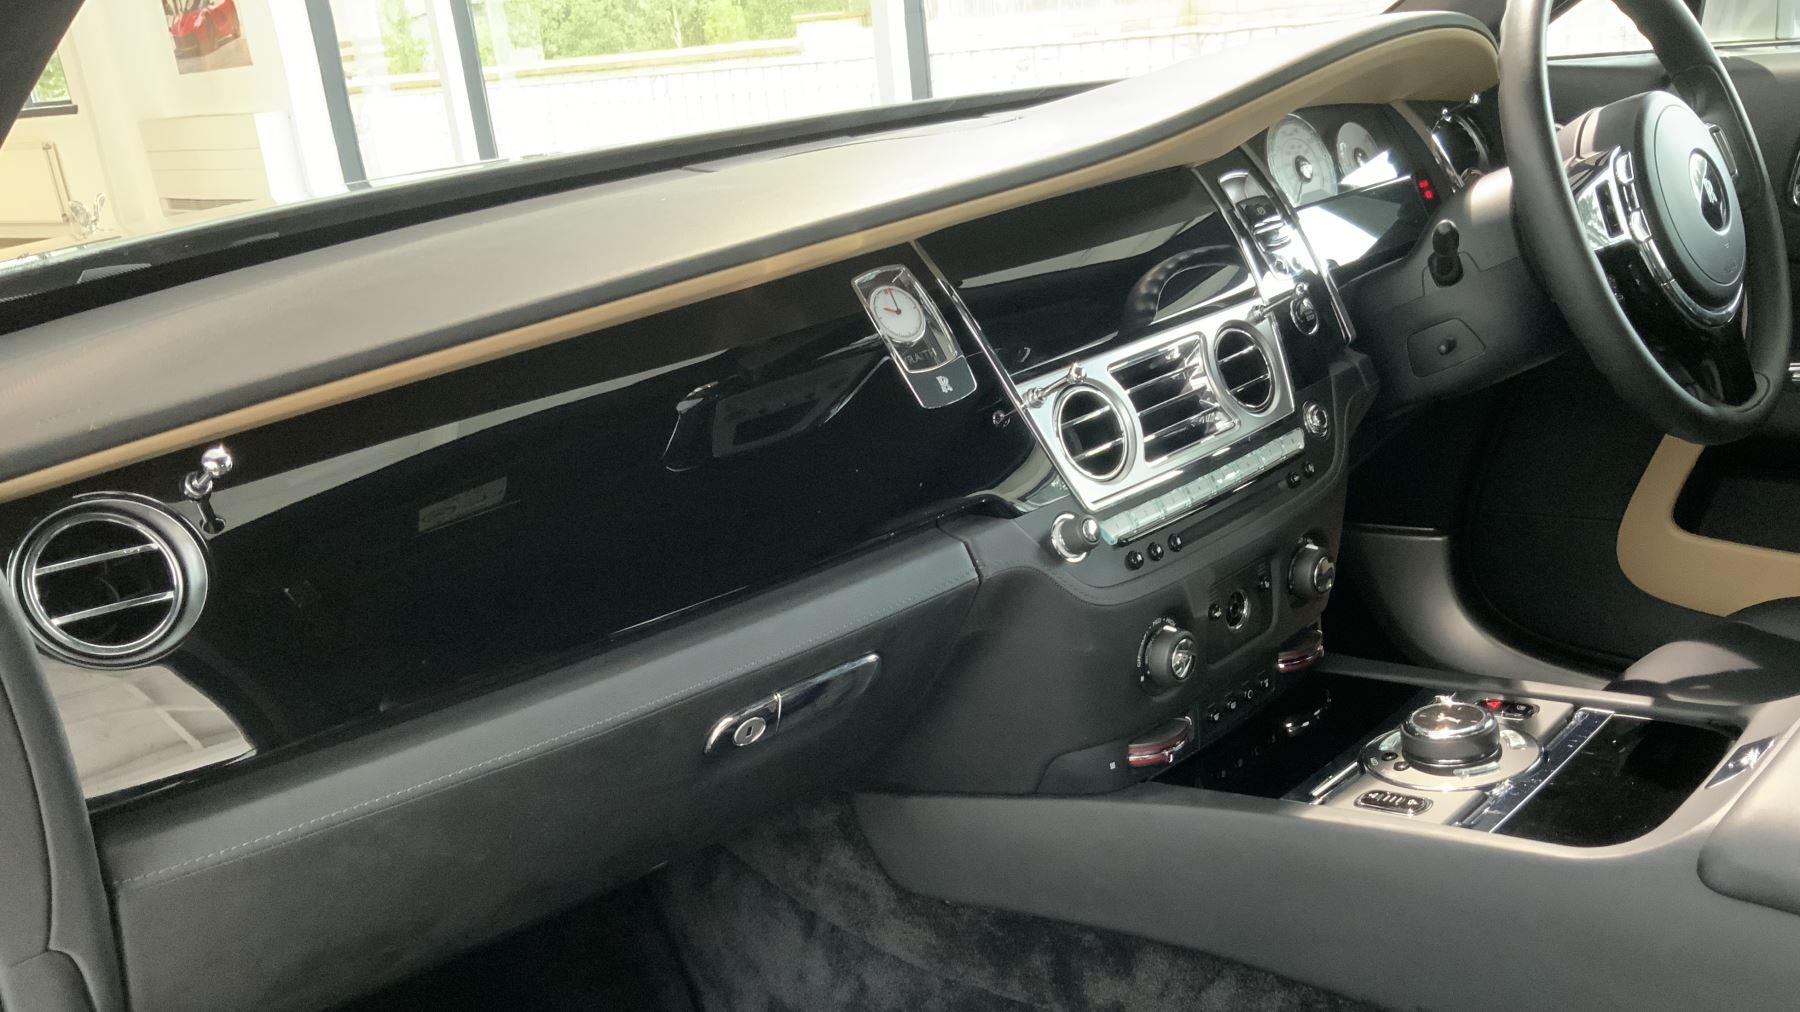 Rolls-Royce Wraith V12 image 21